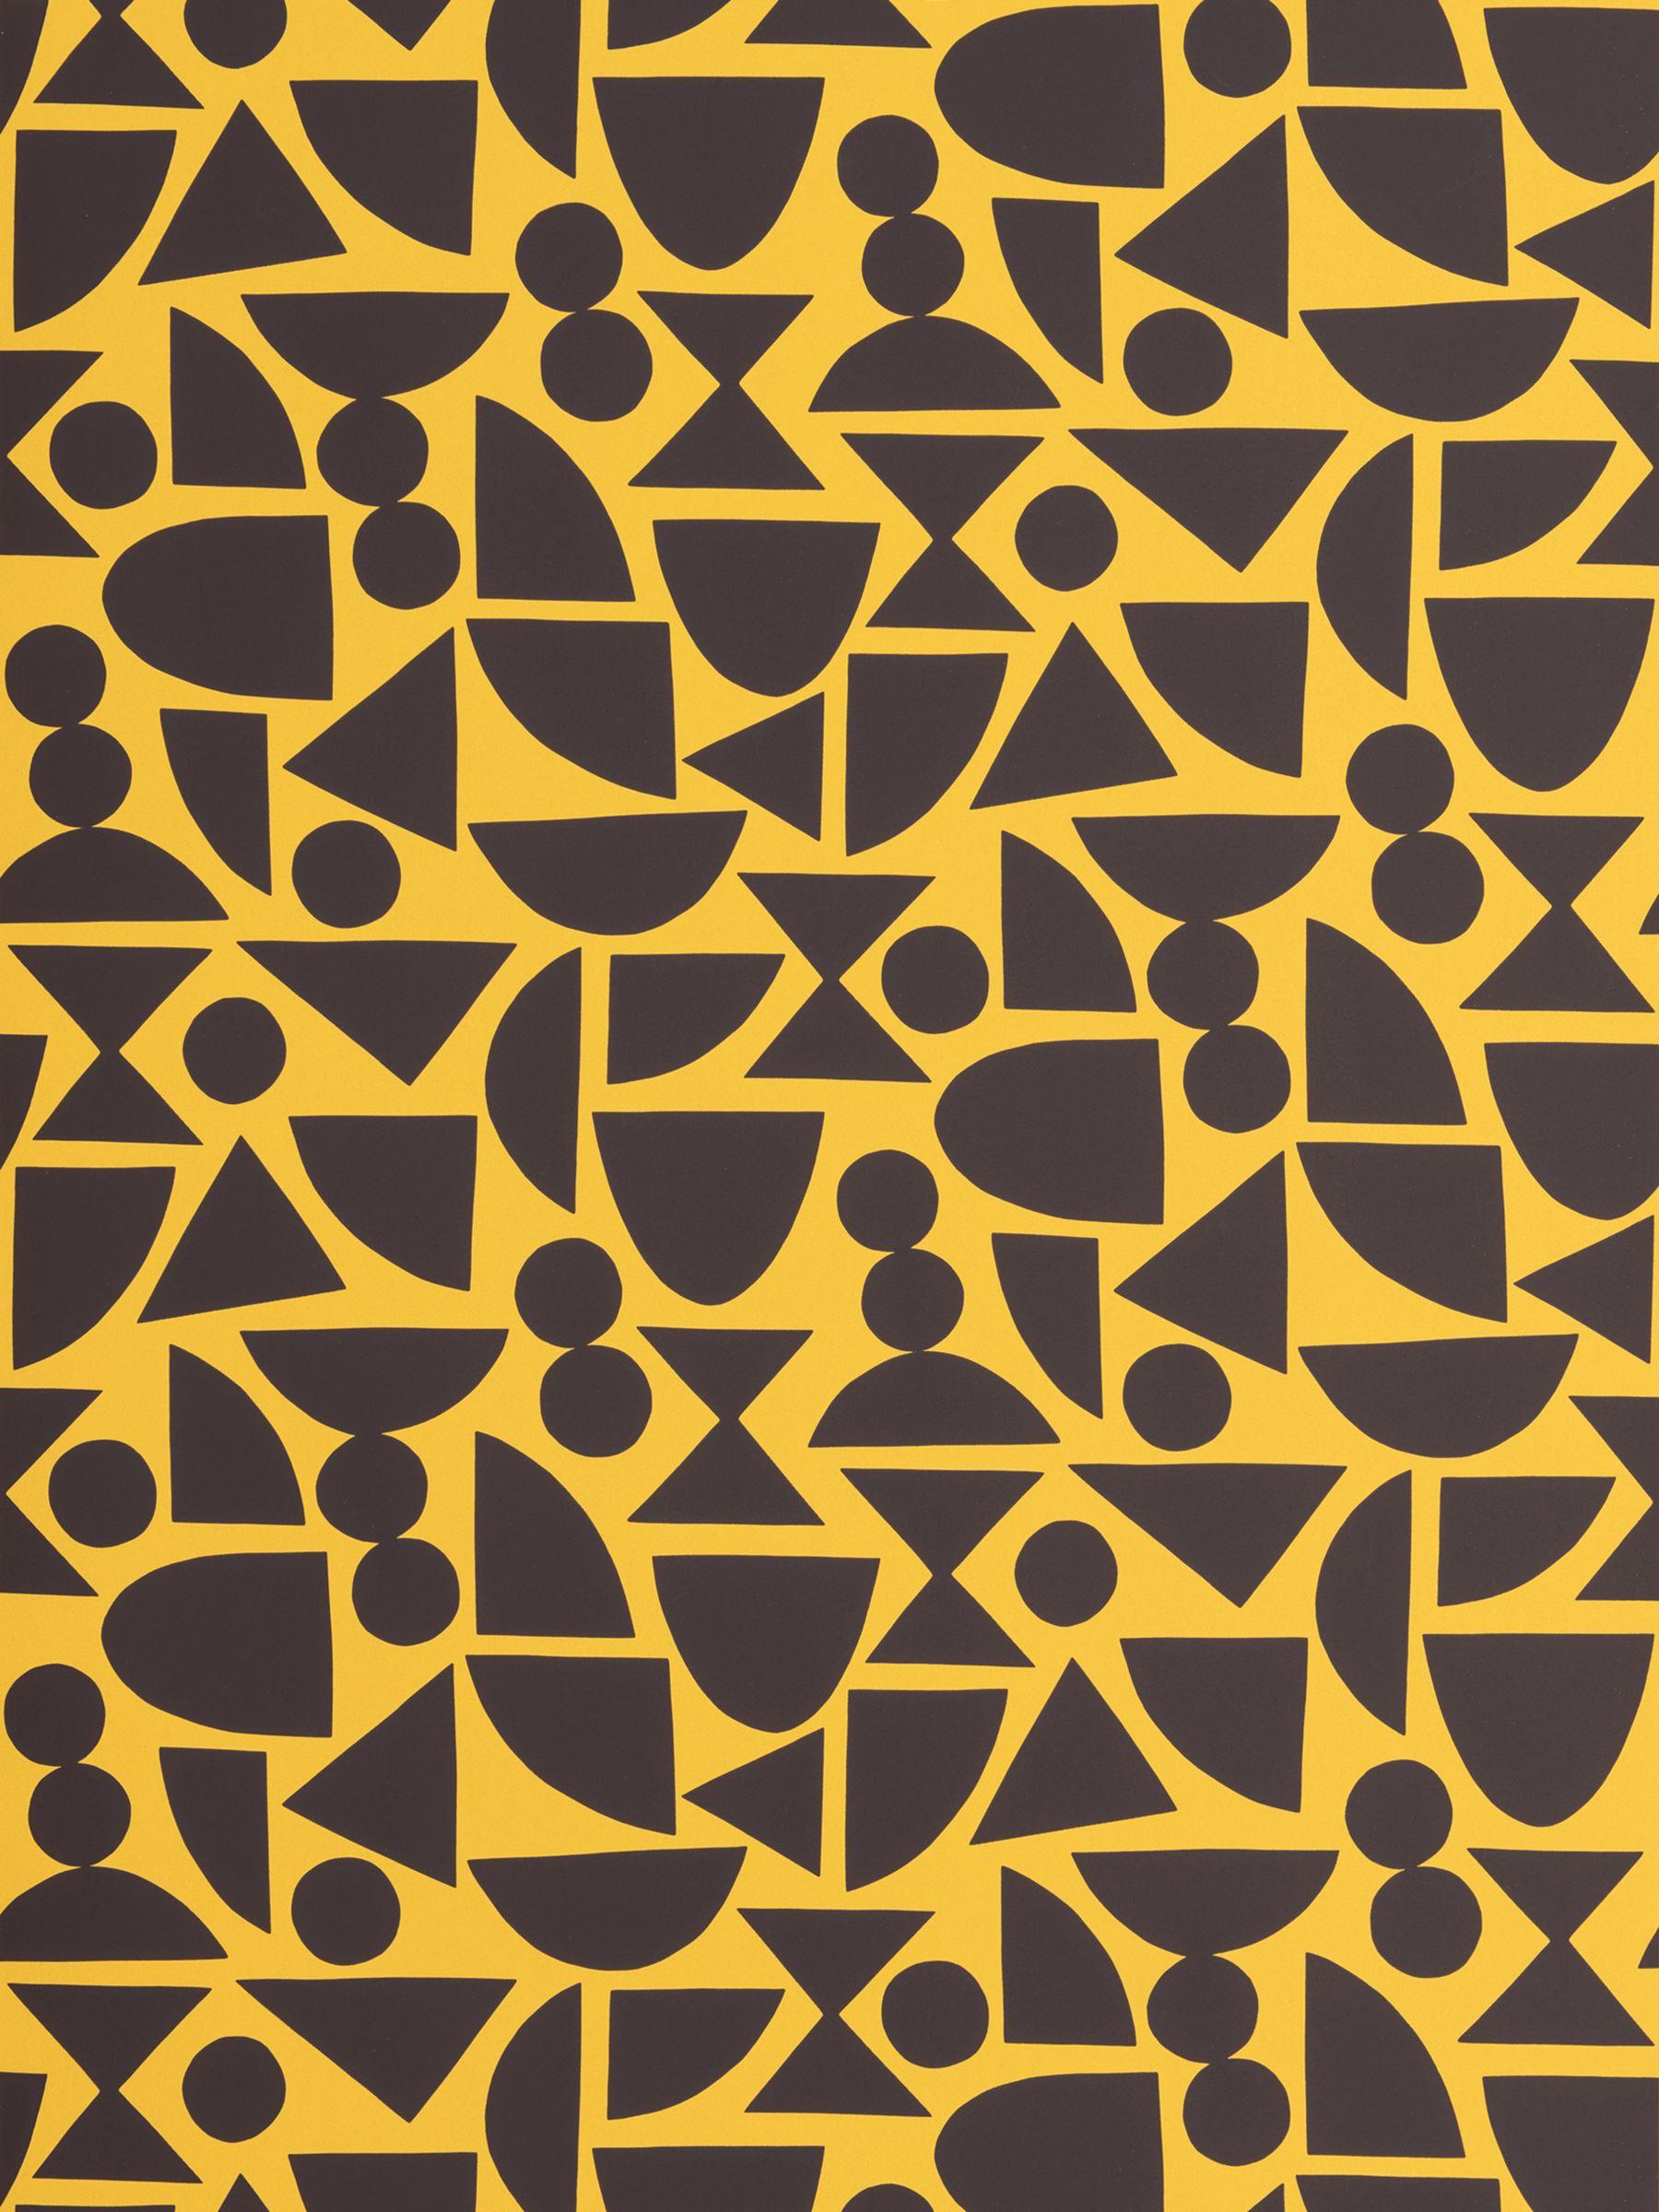 MissPrint MissPrint Shapes Wallpaper